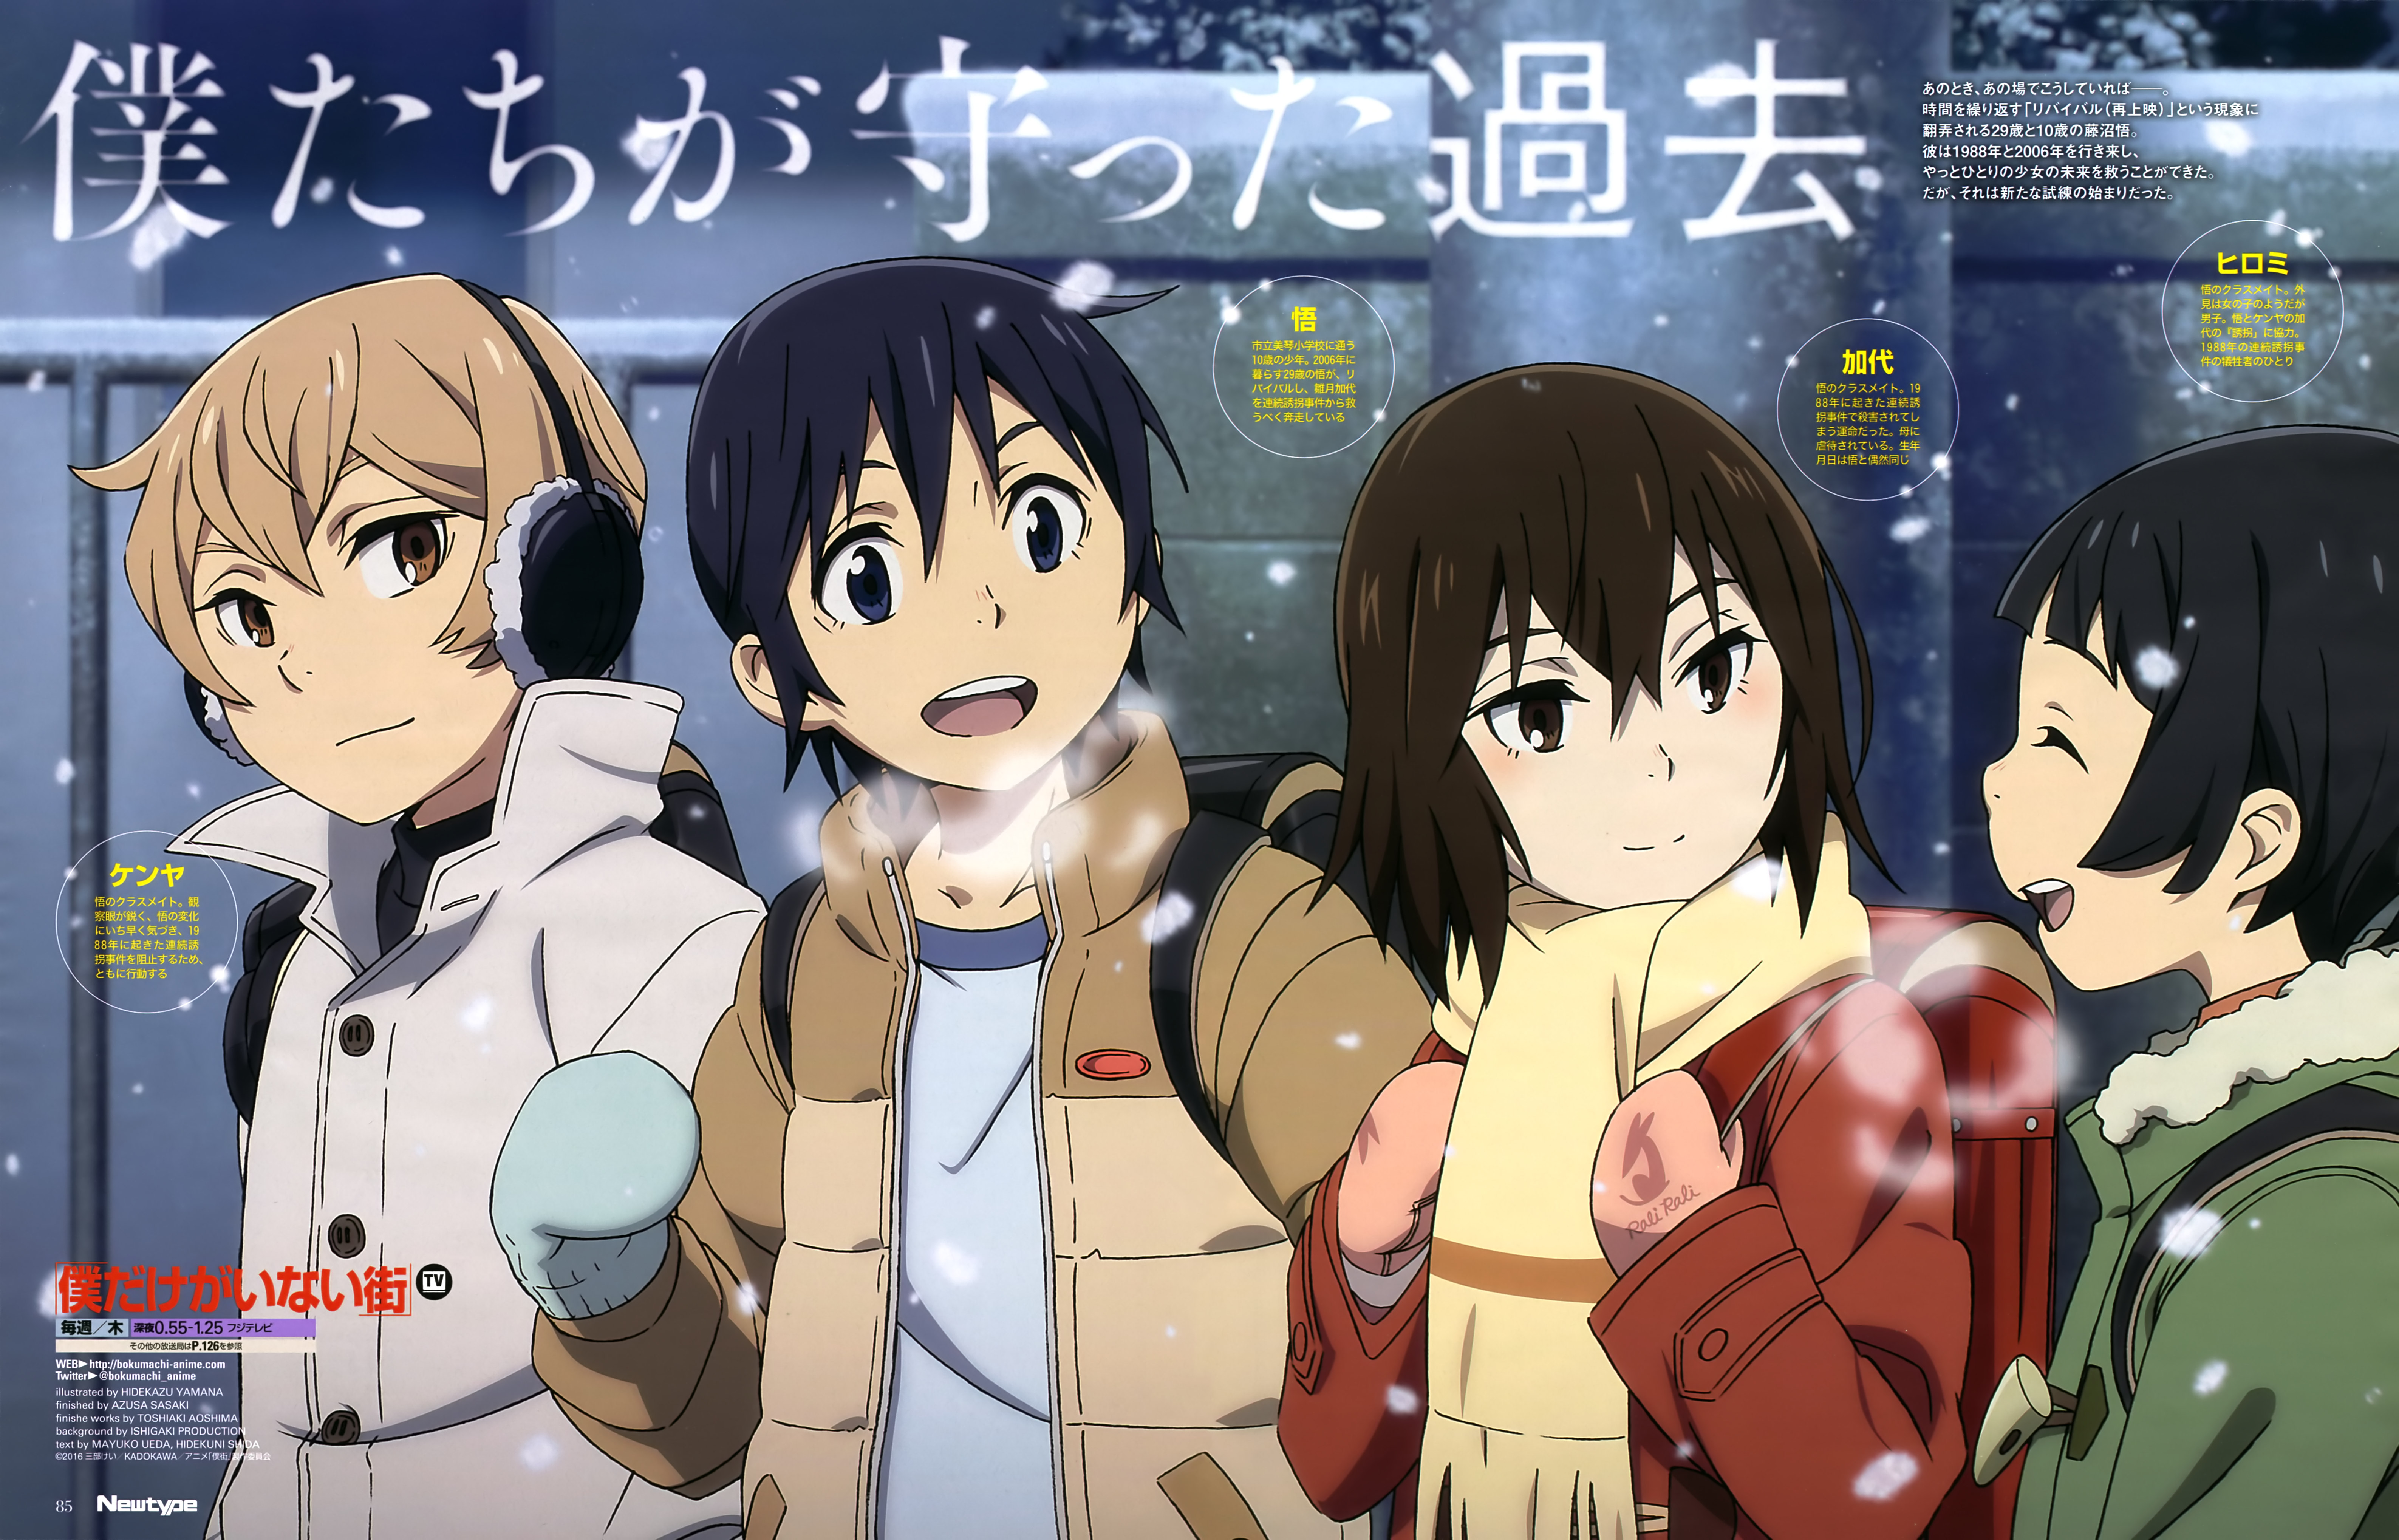 Boku Dake Ga Inai Machi ERASED Fondo De Pantalla Containing Anime Entitled Kenya